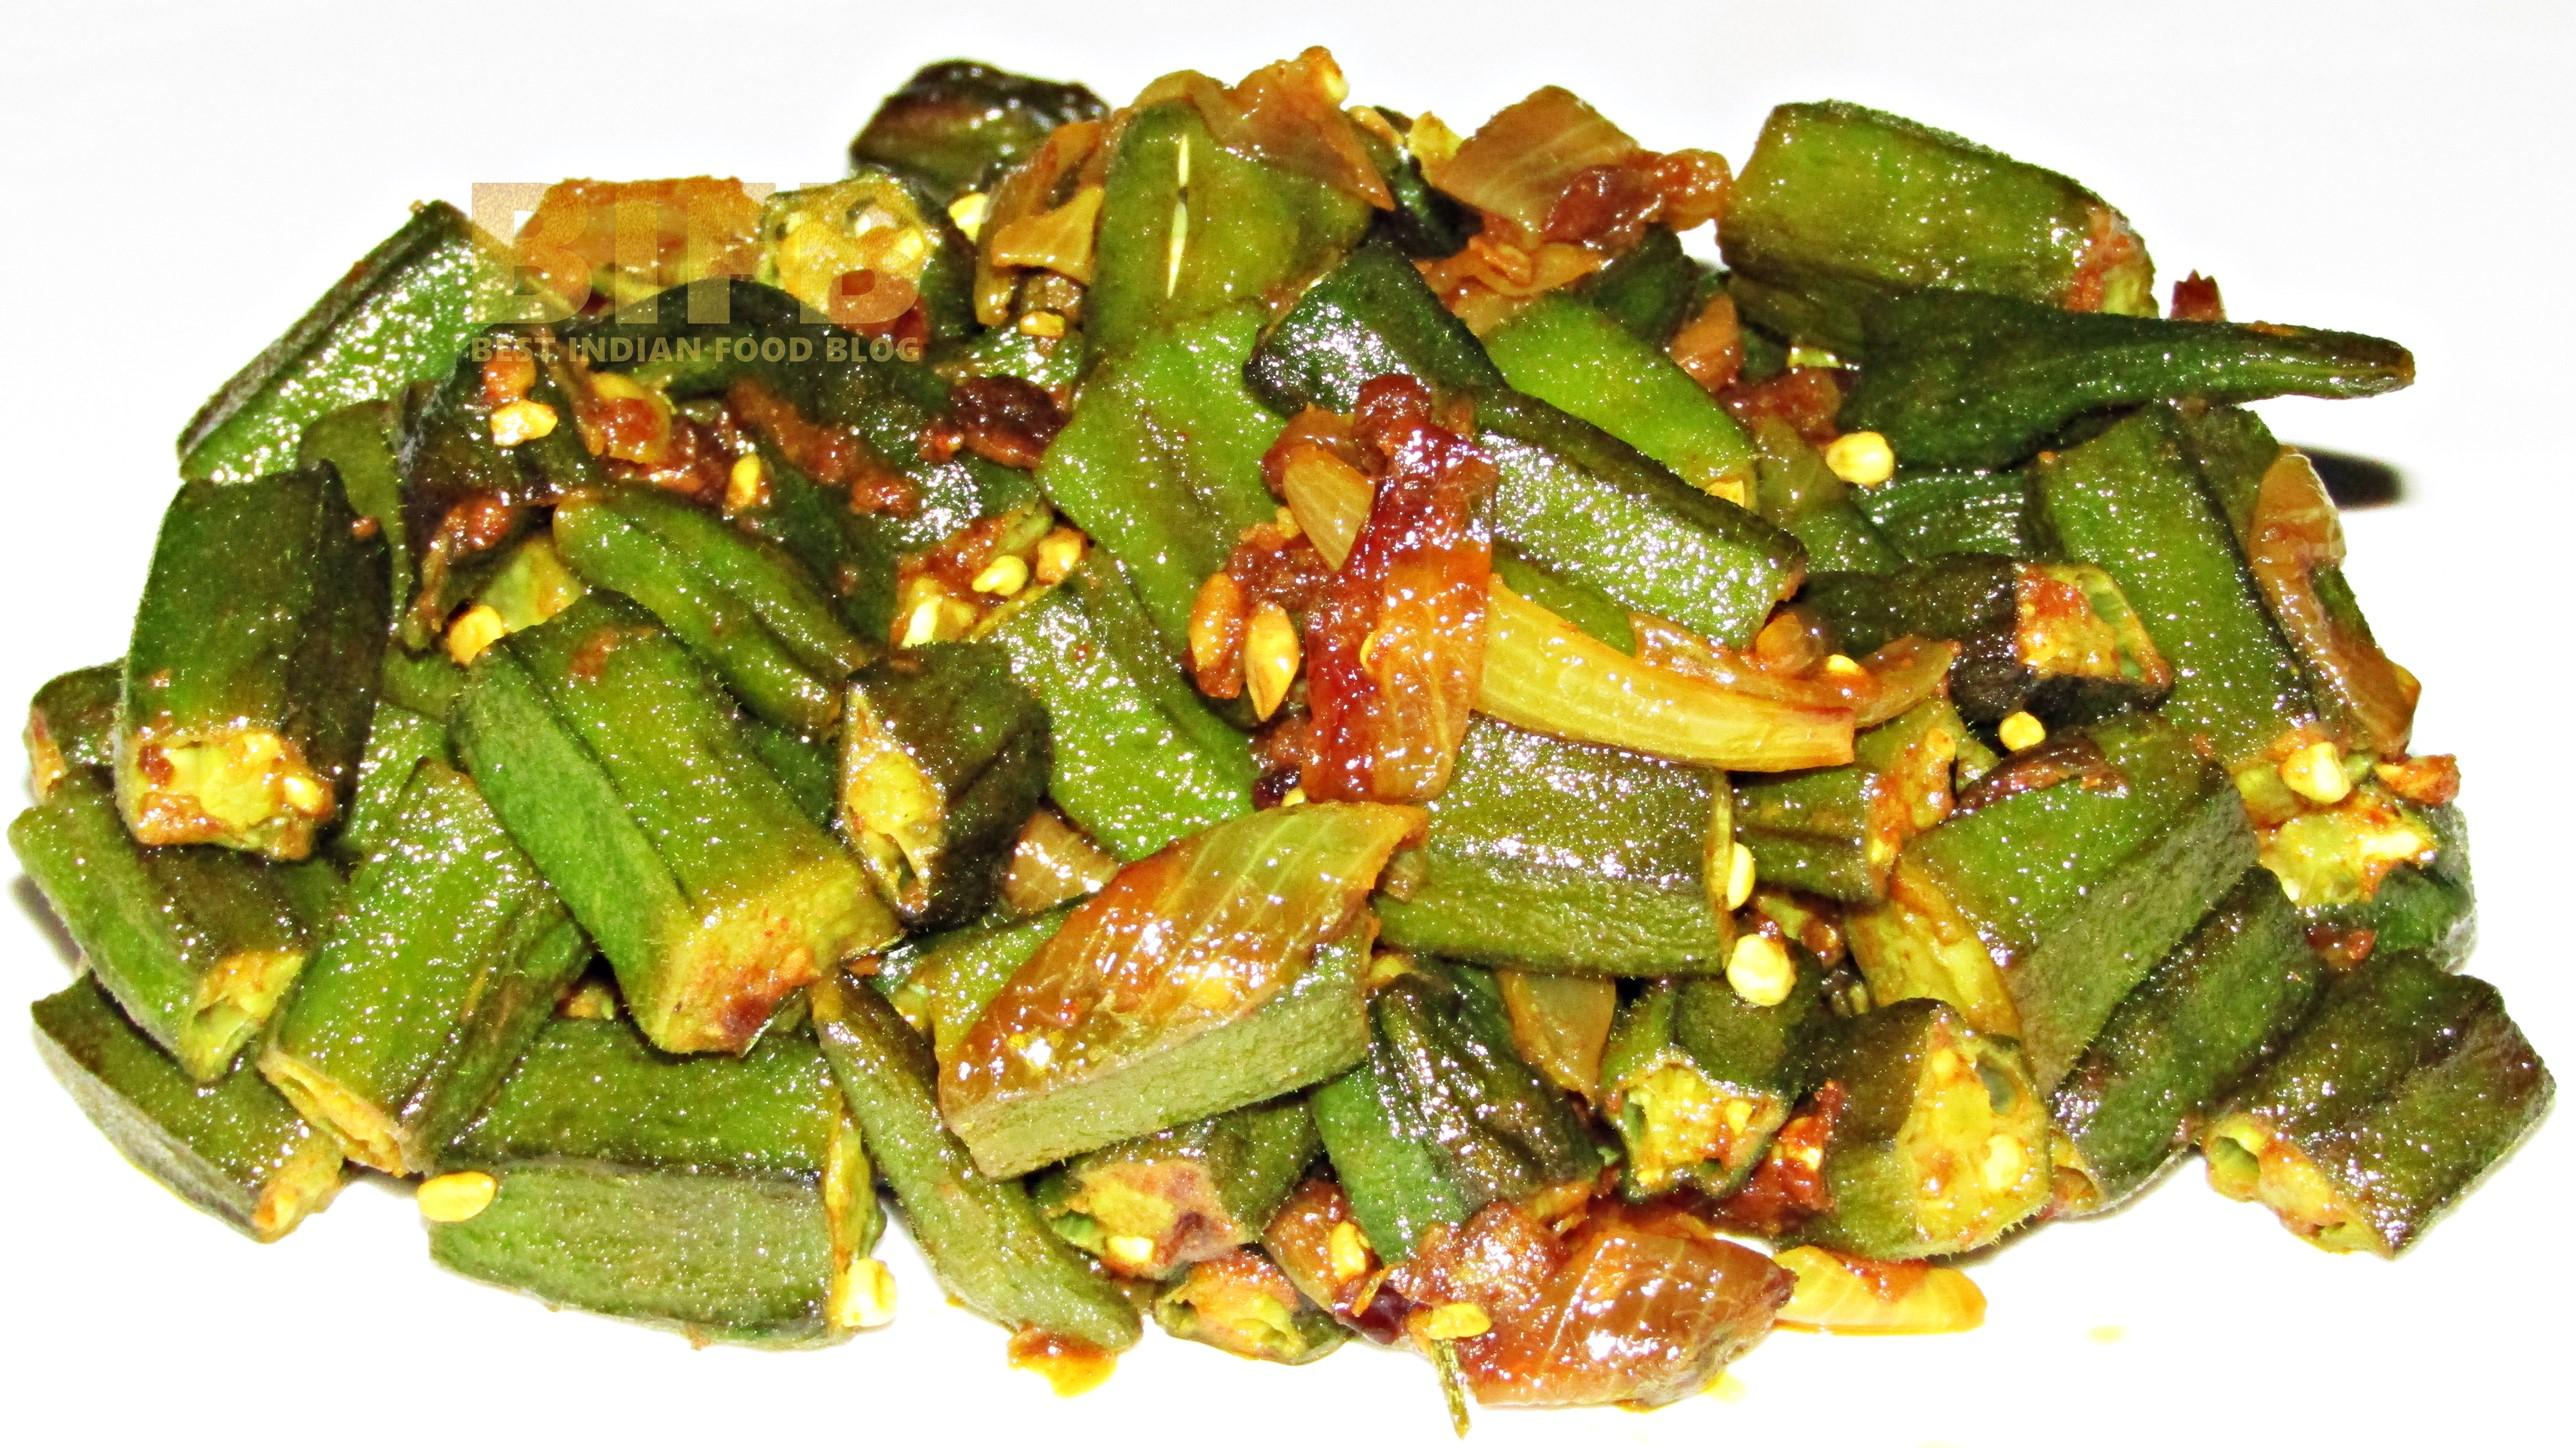 Pyaaz Wali Bhindi from Uttar Pradesh, India | Best Indian Food Blog